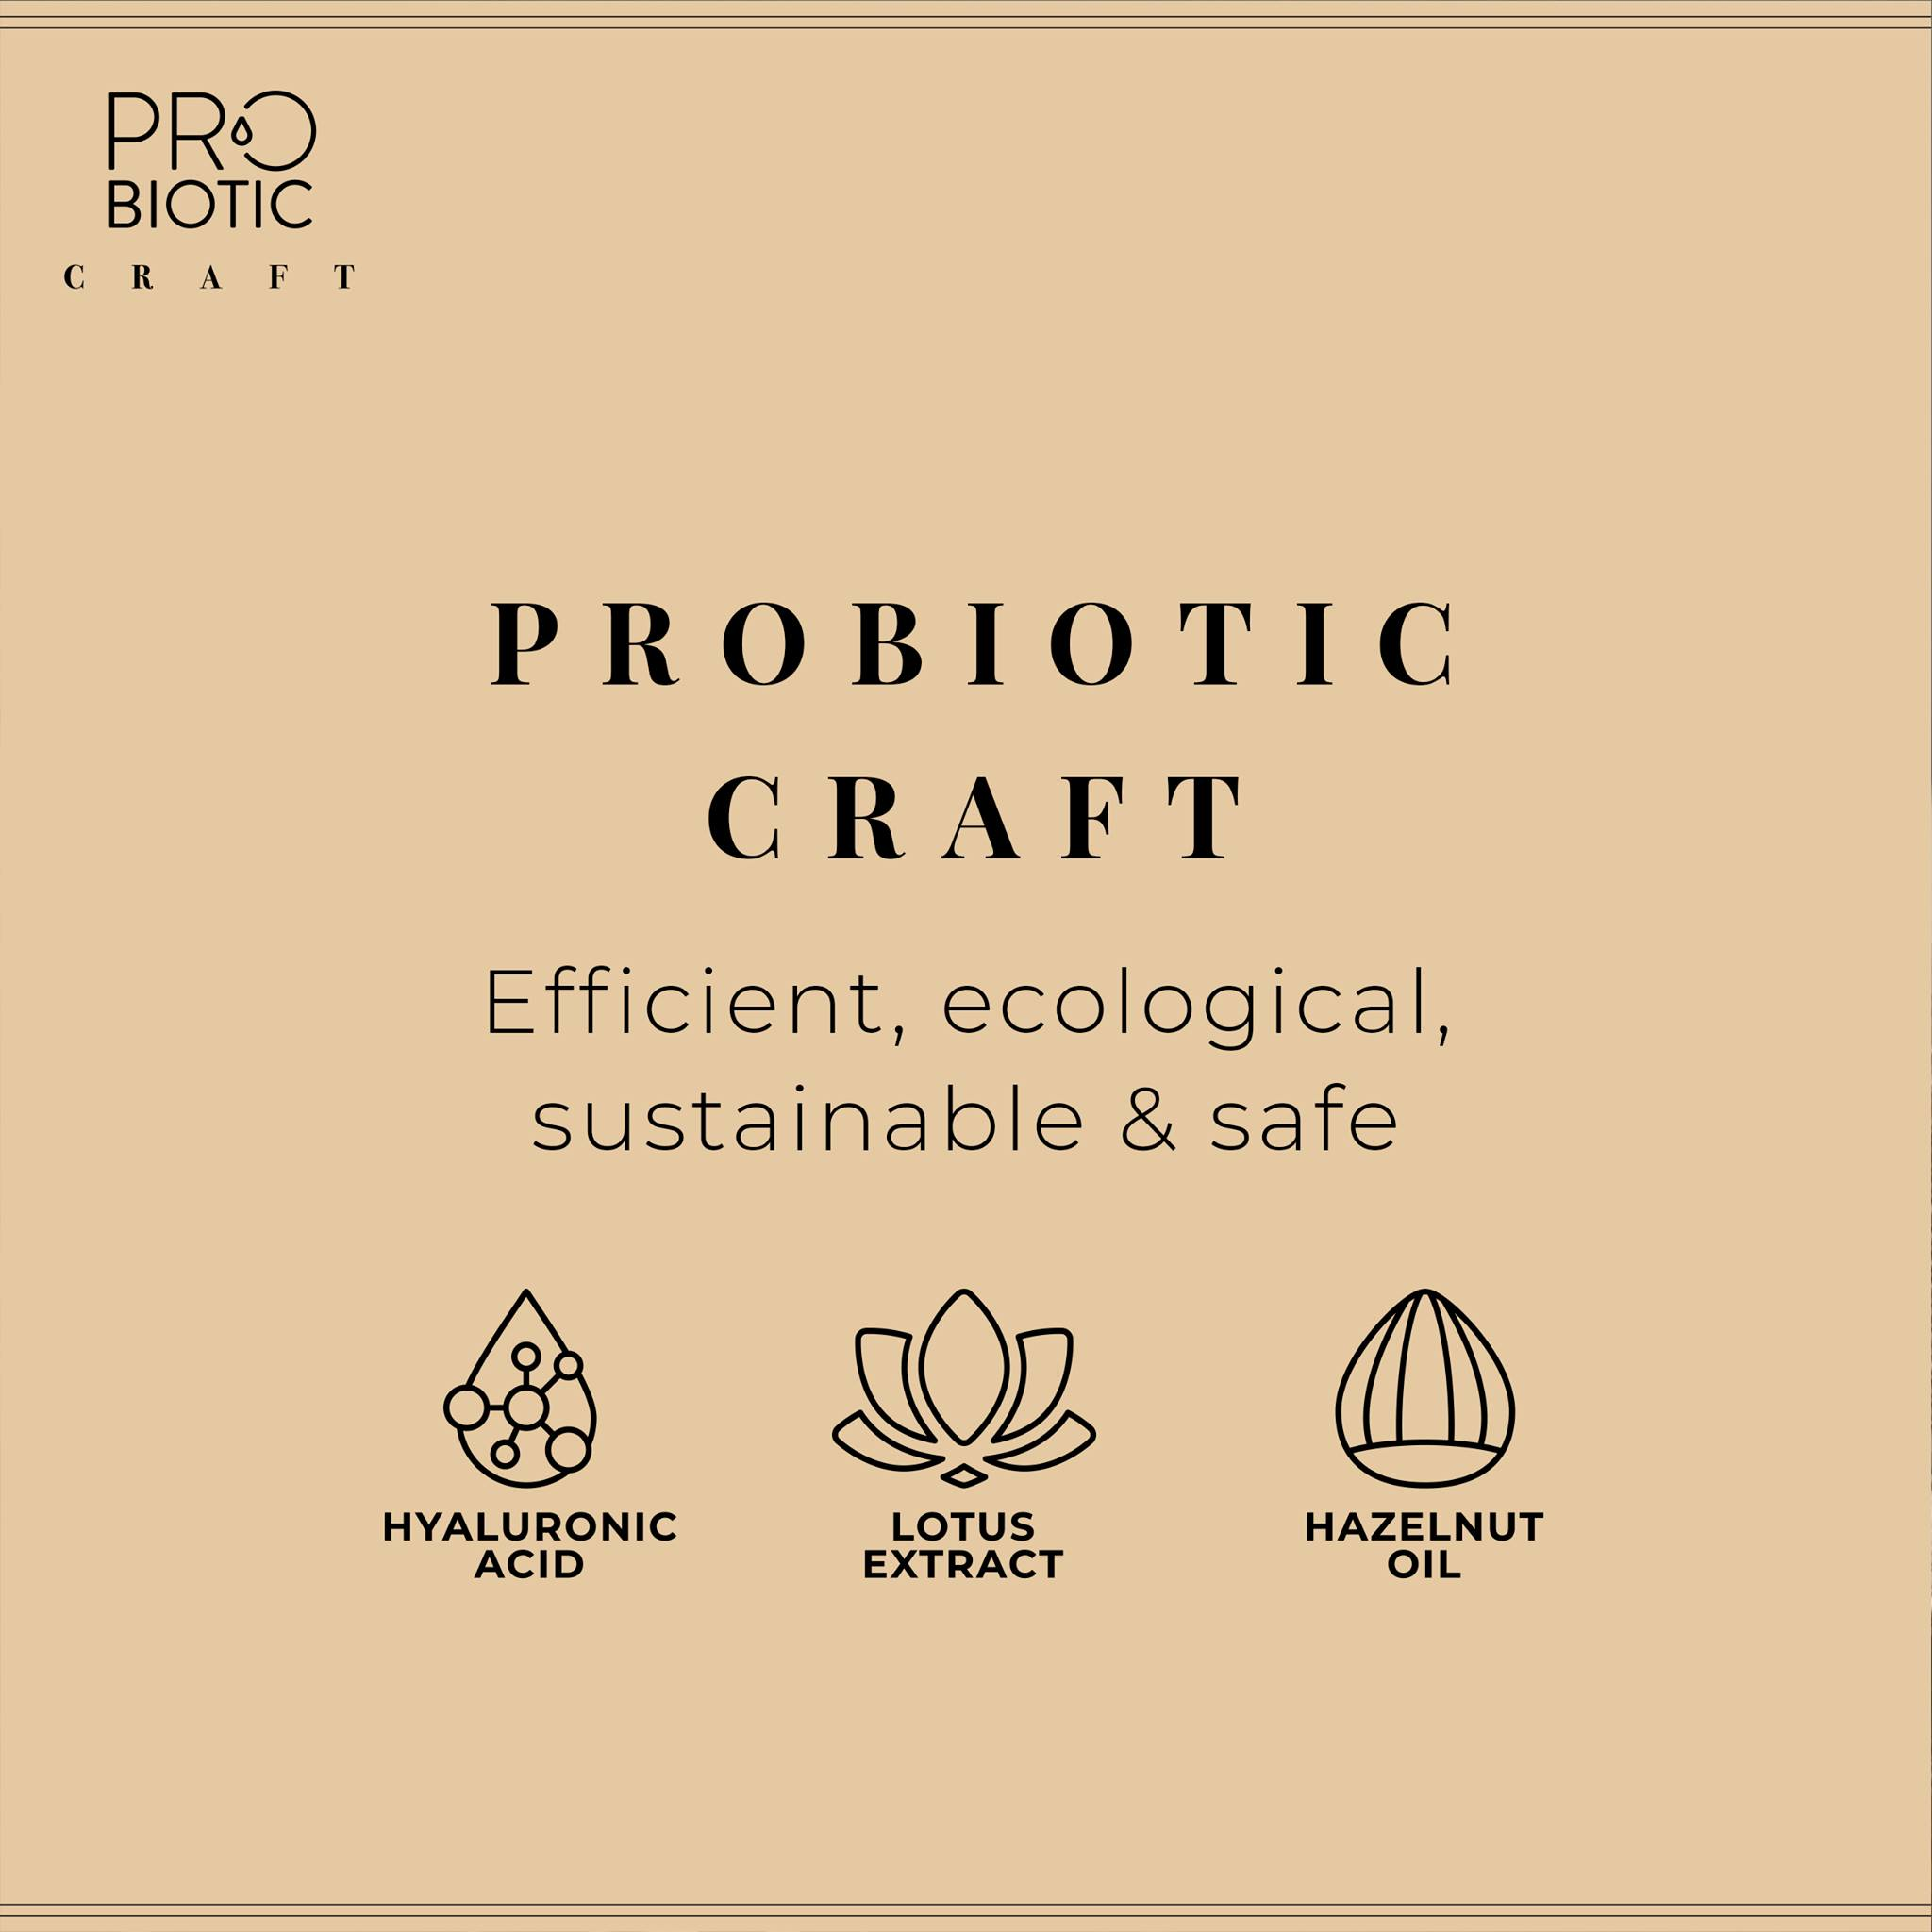 Probiotic Craft økologiske rengjøringsprodukter